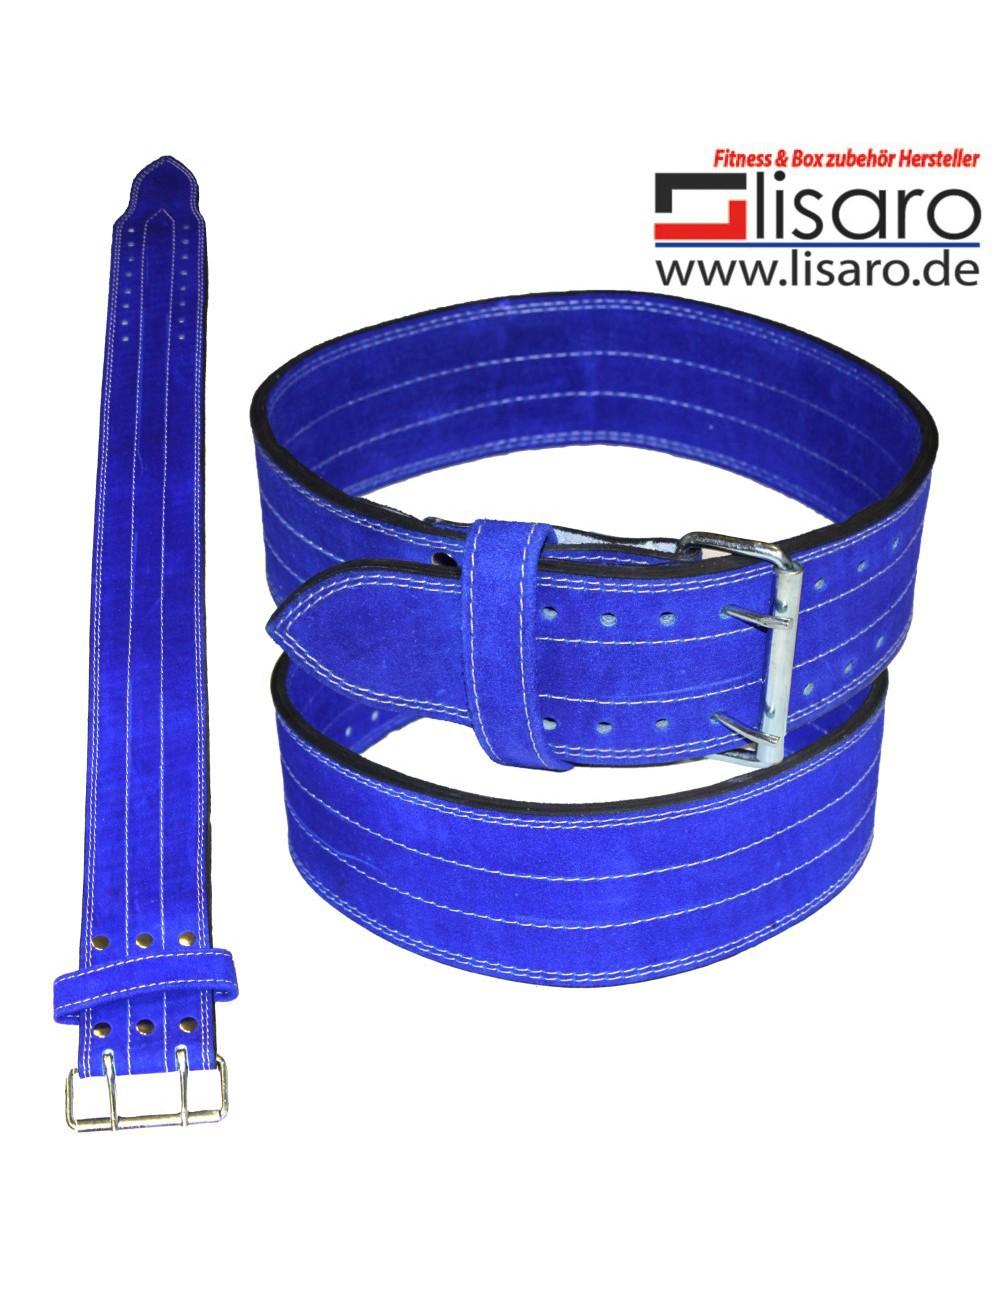 Power Wettkampfgürtel / KDK-Gürtel aus Leder blau - 1